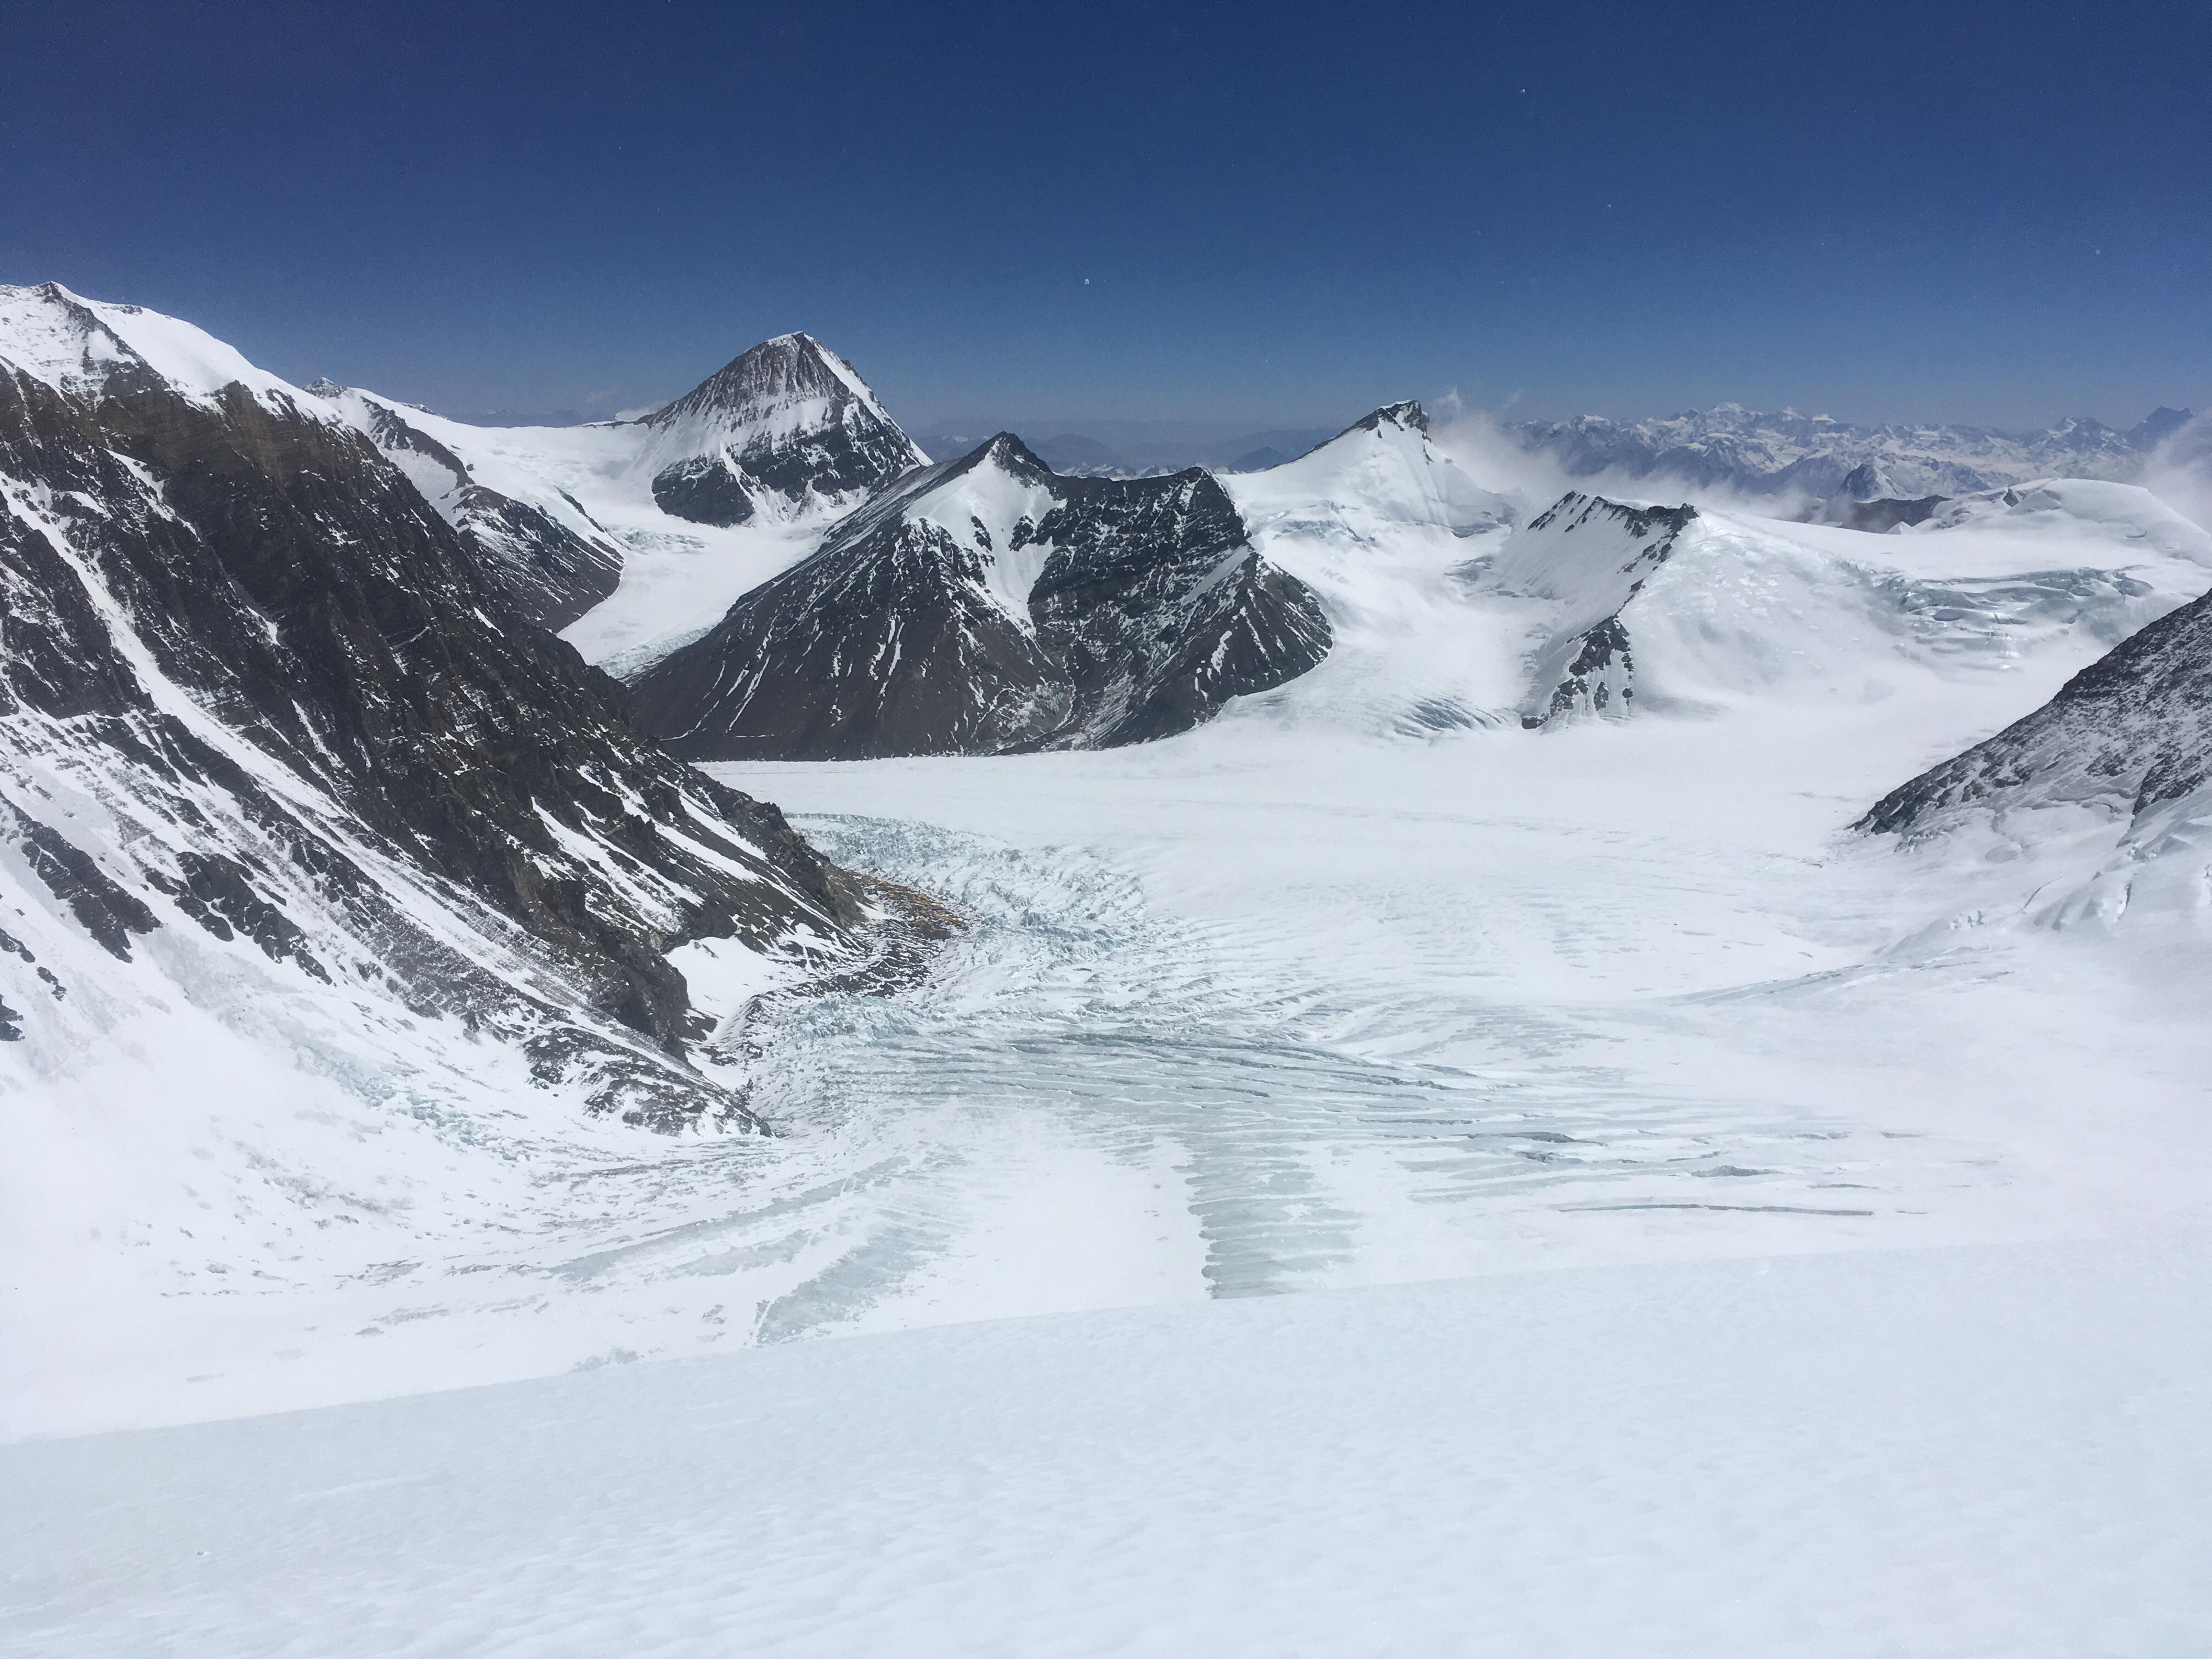 Вид на ледник Восточный Ронгбук с Северного Седла 7000 м. На морене виден лагерь на 6400